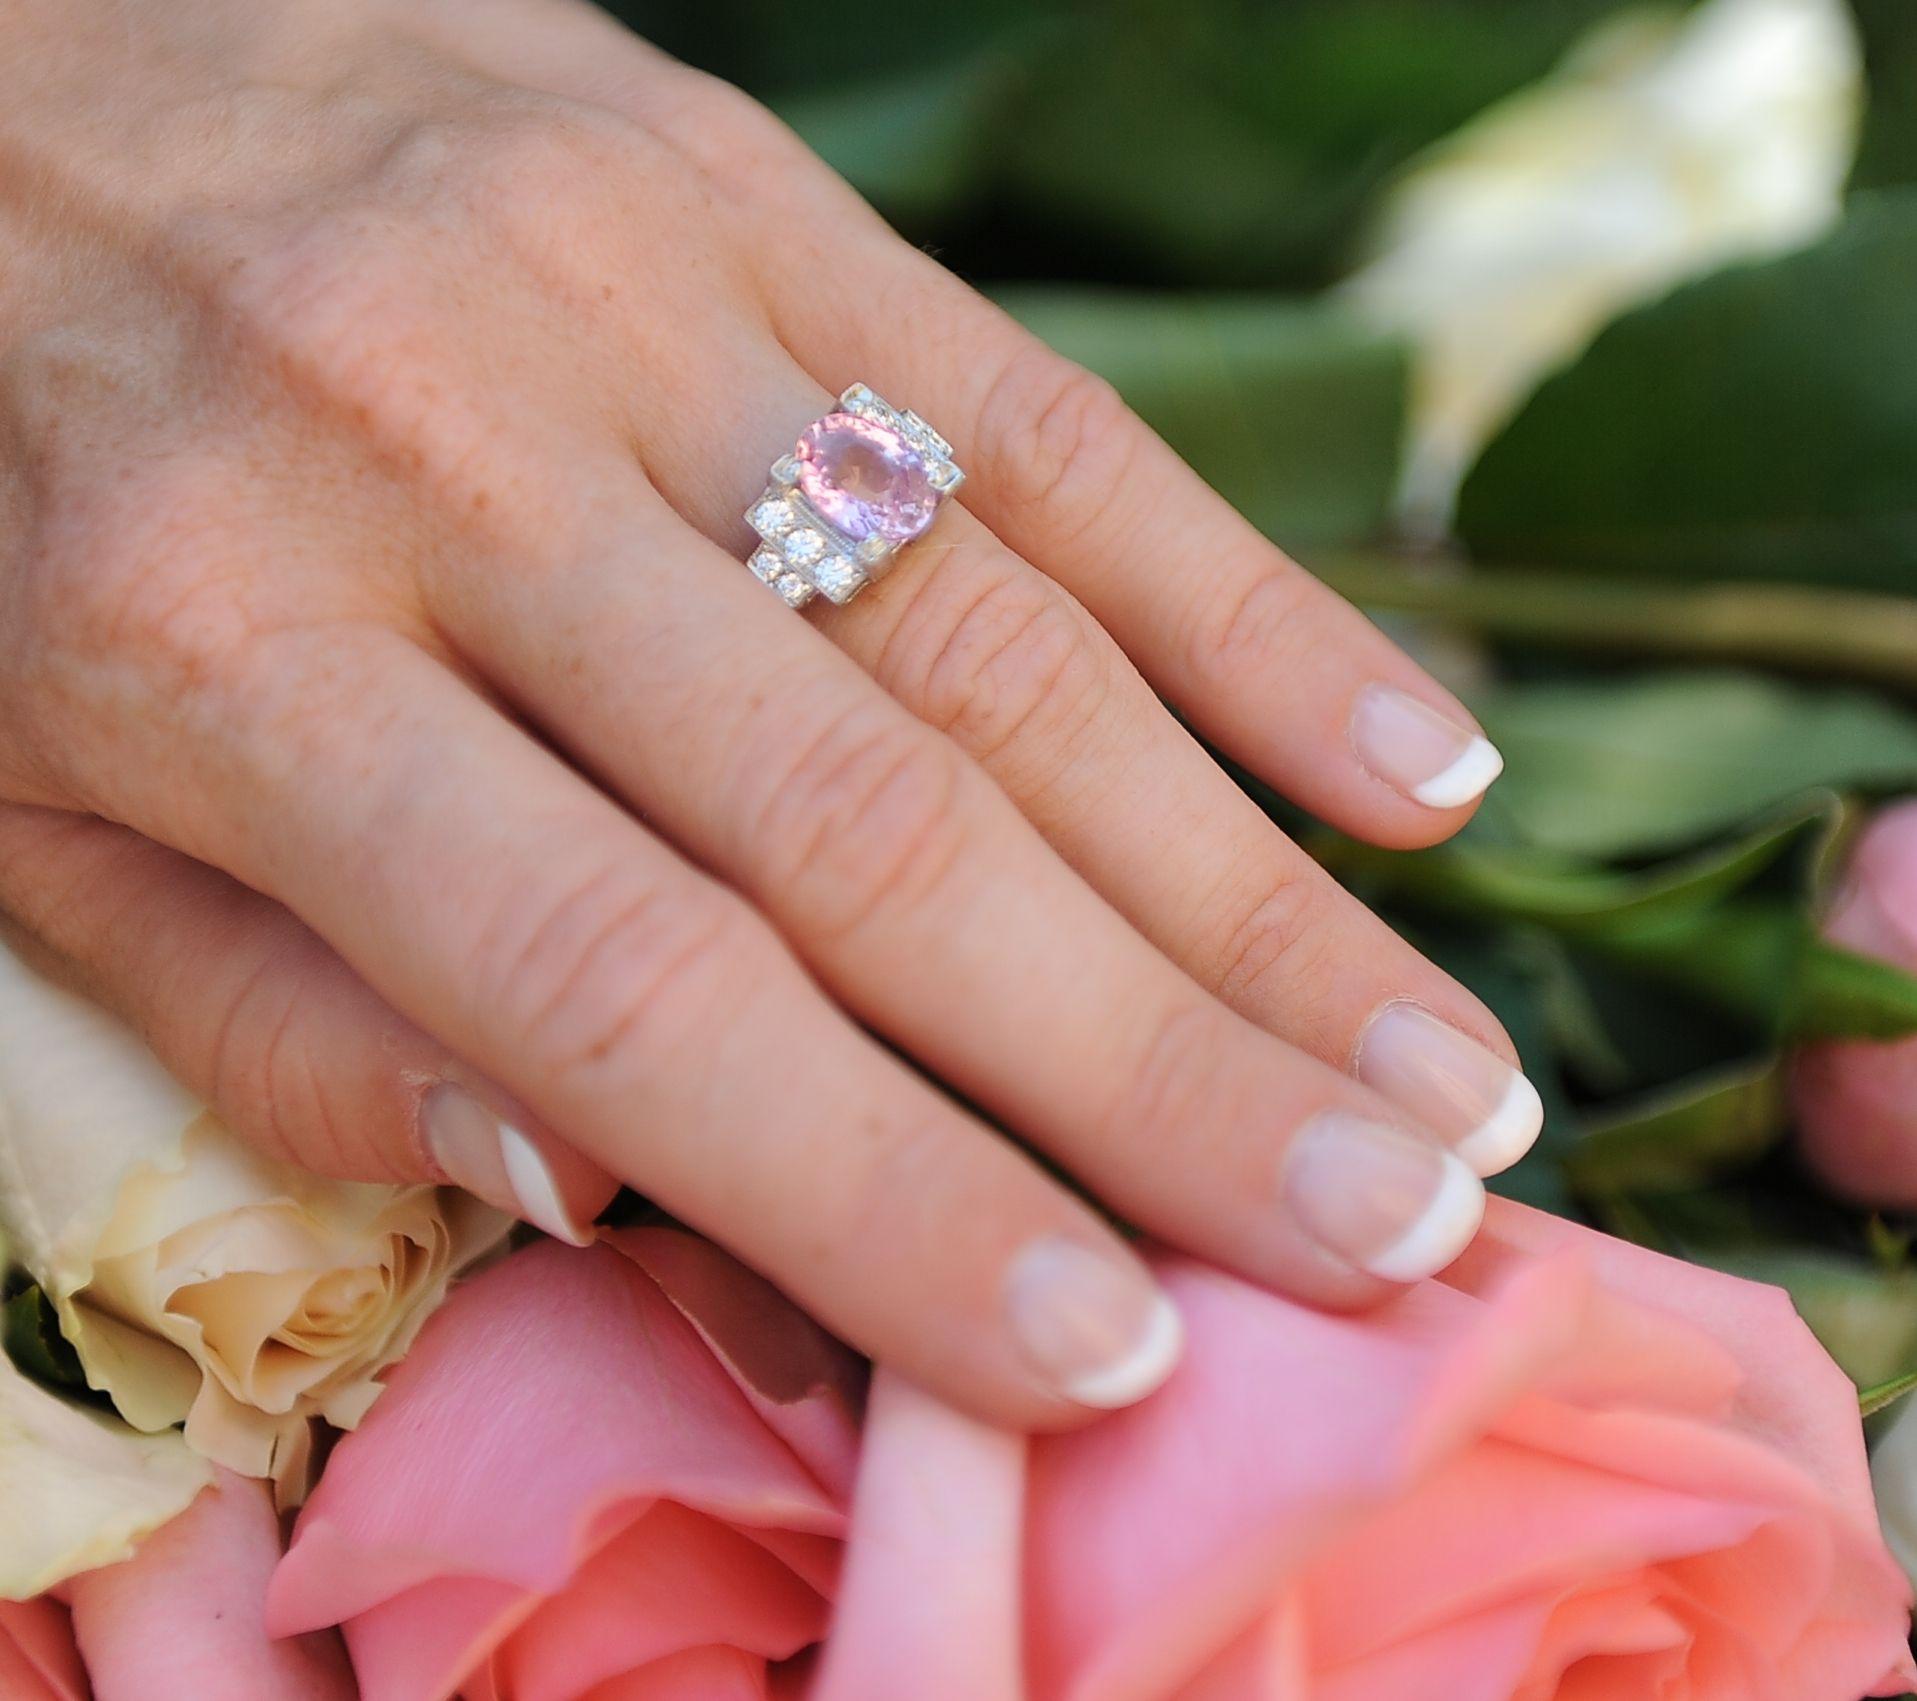 thanksgiving #padparadscha #ring #artdeco #jewelry #present | The JG ...